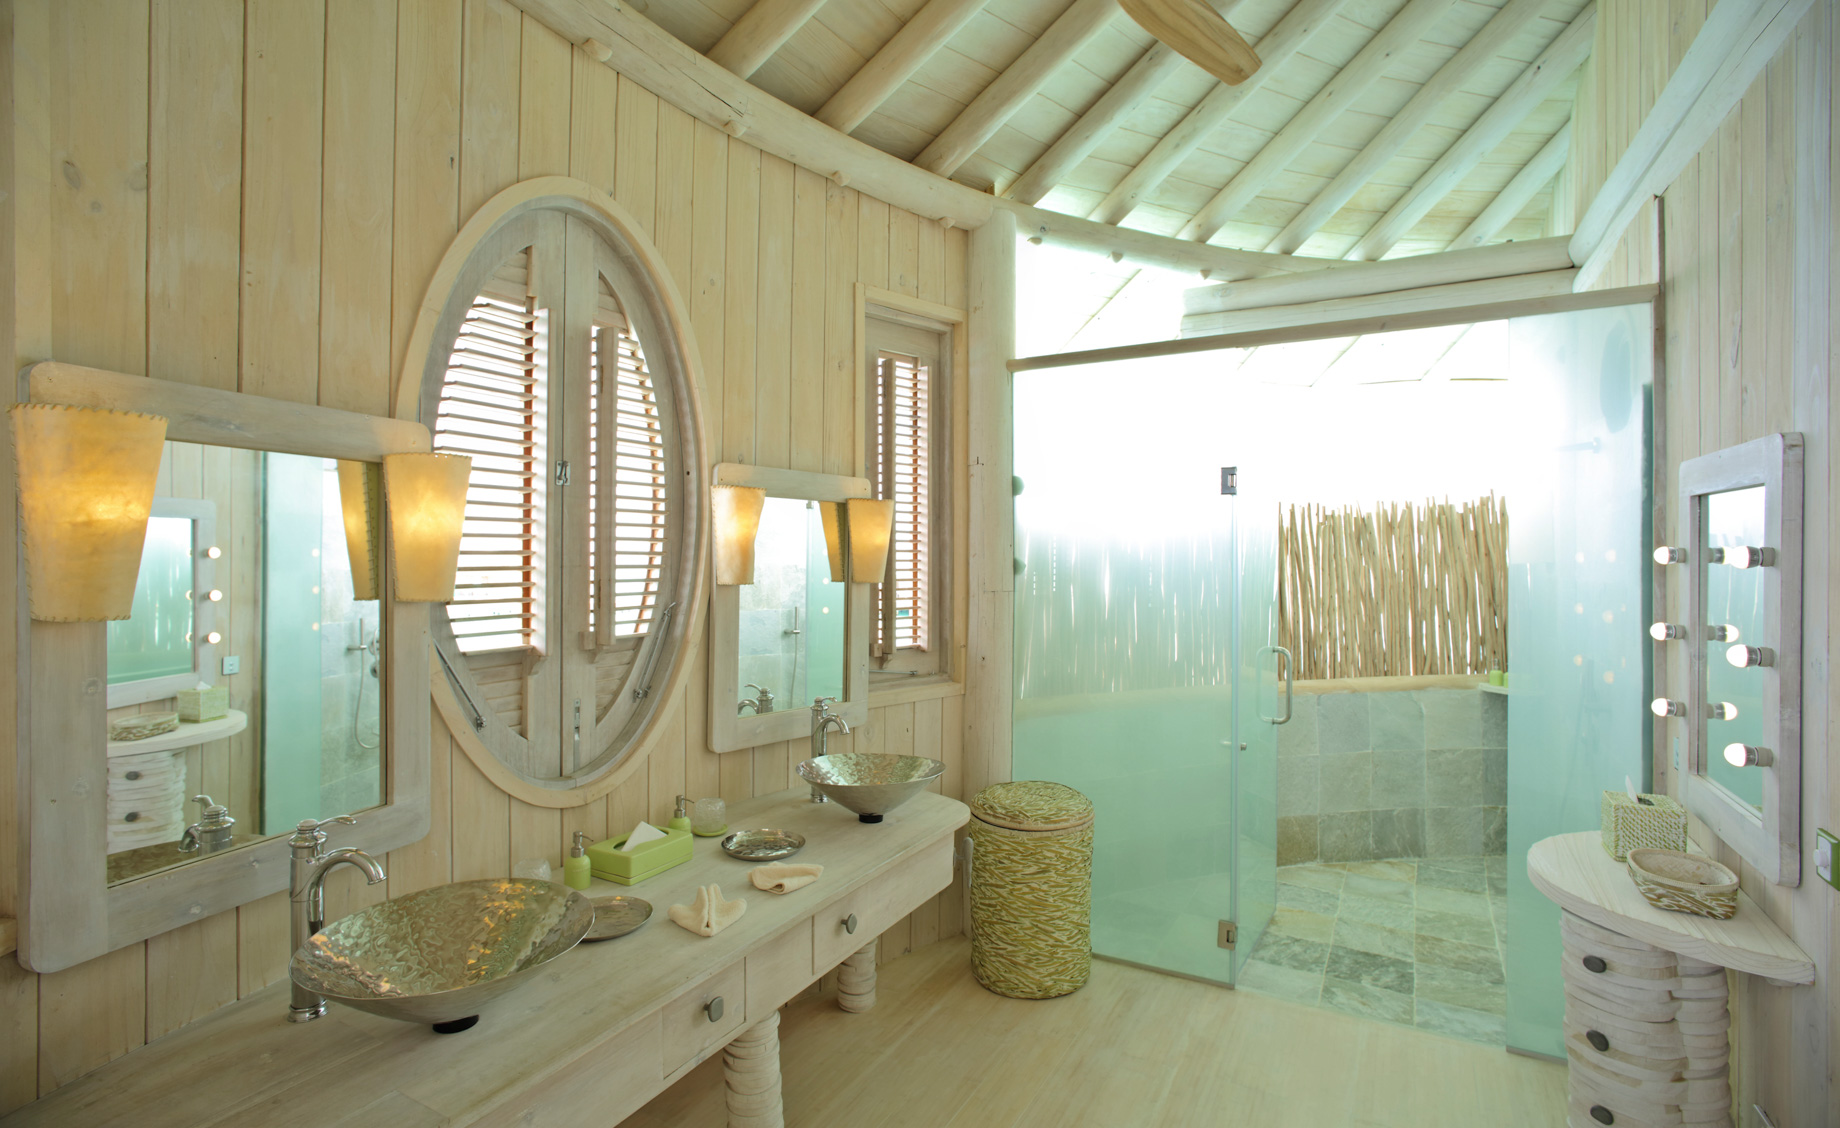 Soneva Jani Luxury Resort - Noonu Atoll, Medhufaru, Maldives - 2 Bedroom Water Retreat Villa Bathroom